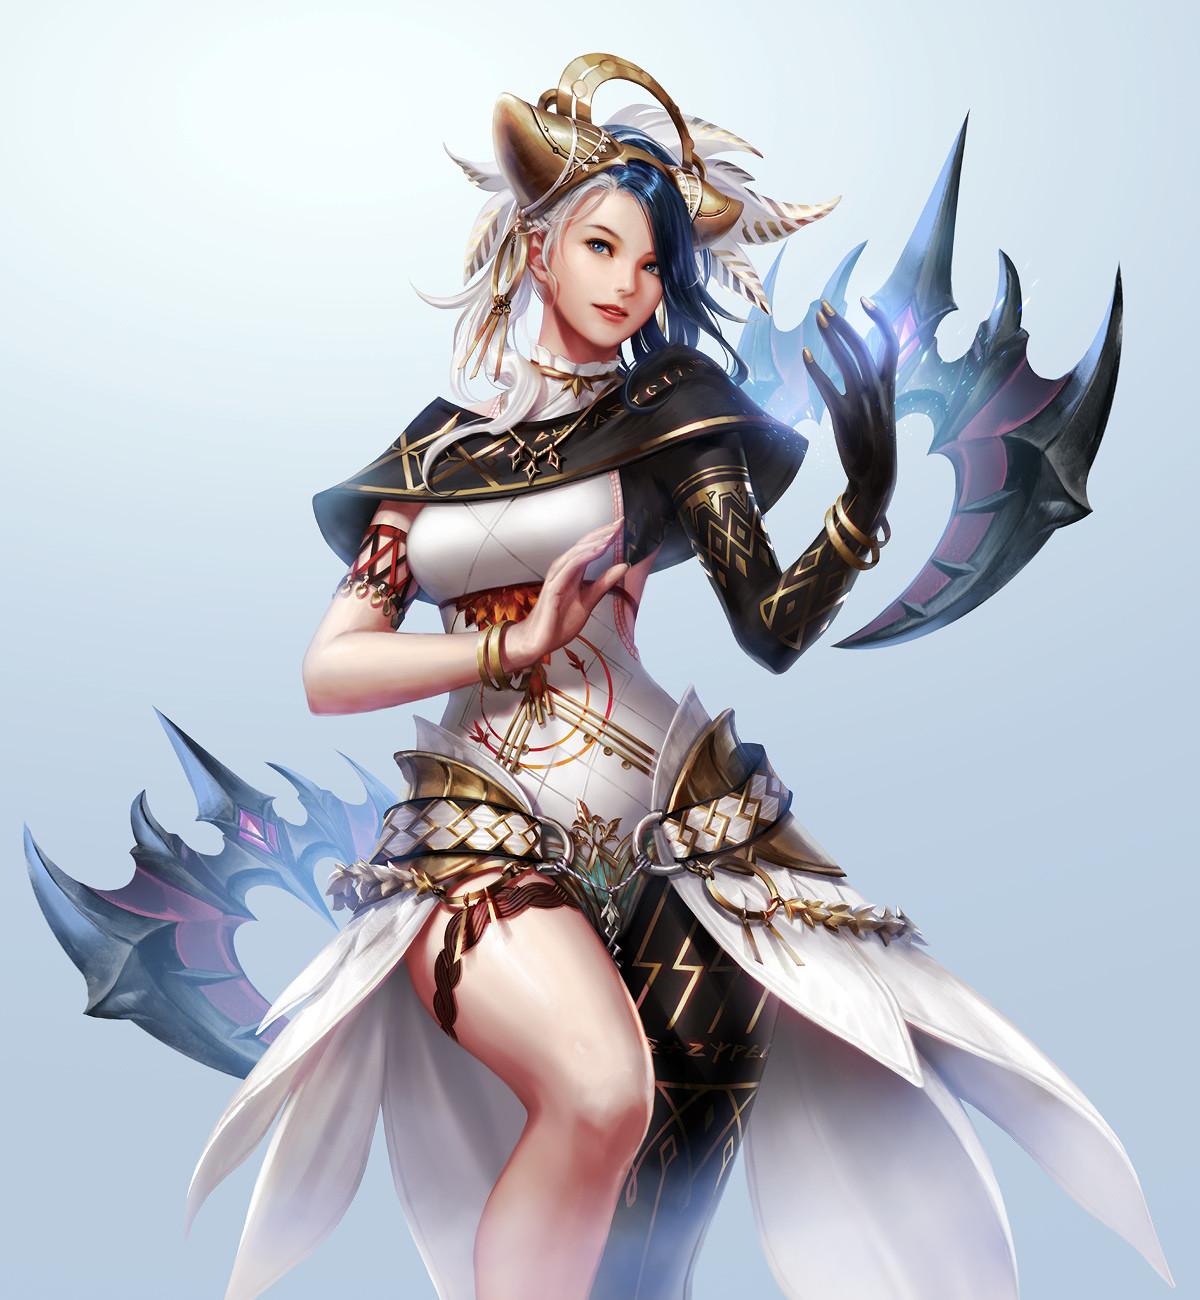 General 1200x1300 Jae-Hoon Kim drawing women hair accessories feathers spell fantasy art dress blue eyes simple background